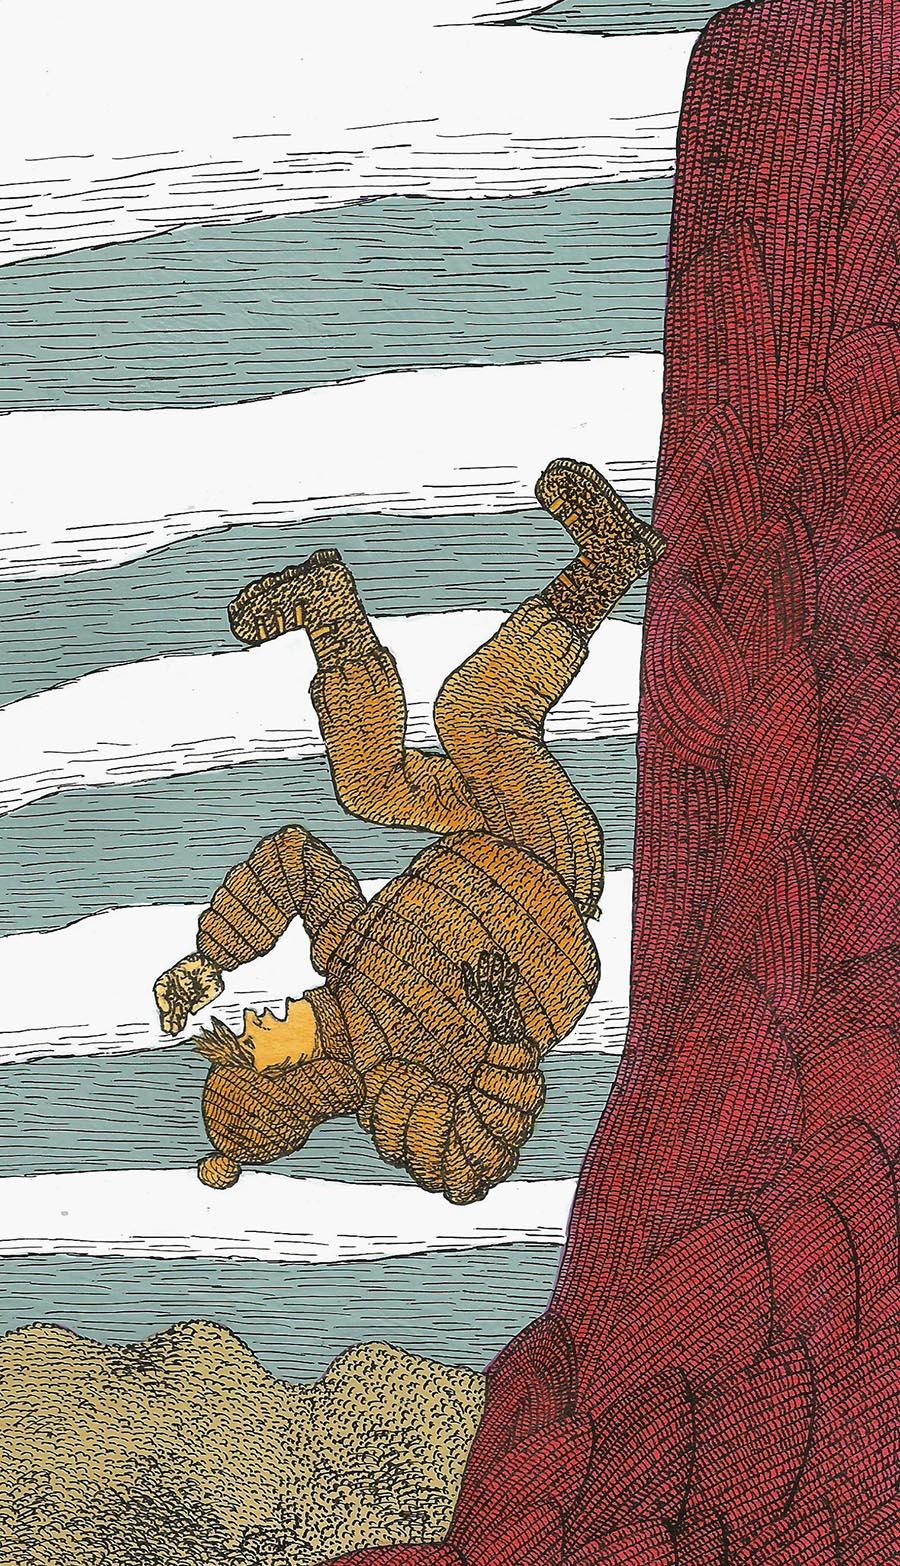 Falling Jonathan Leach